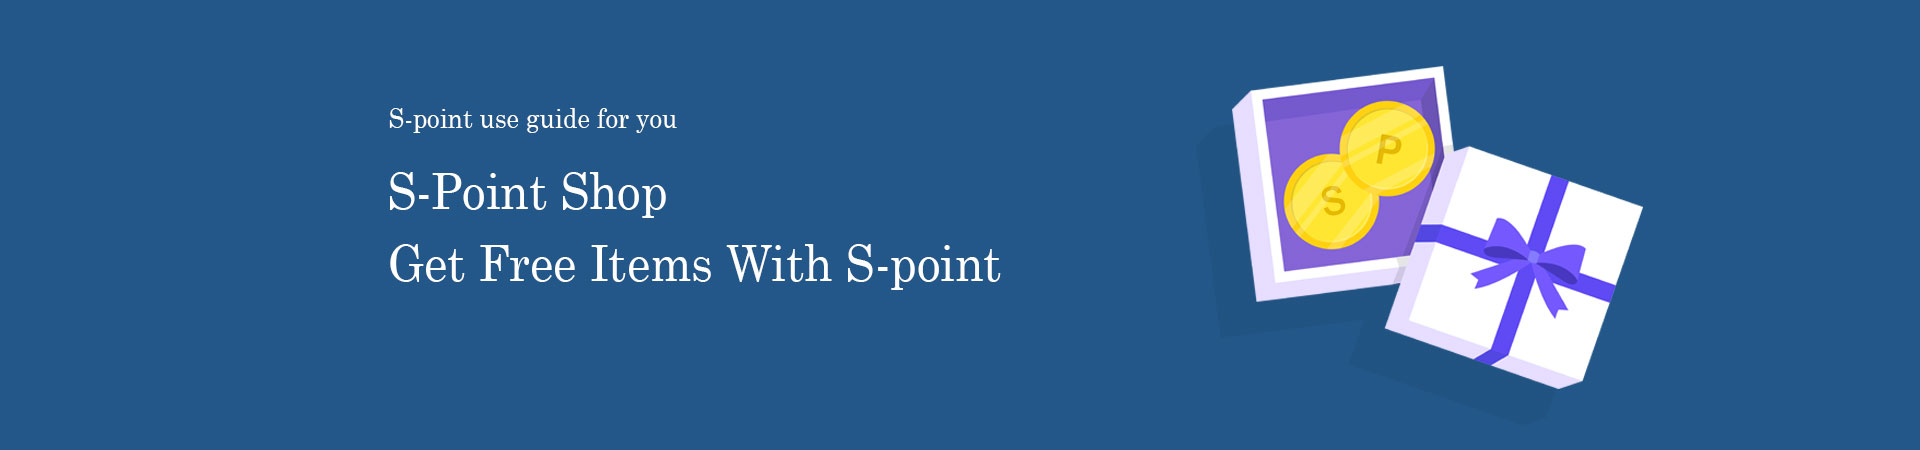 s point s포인트